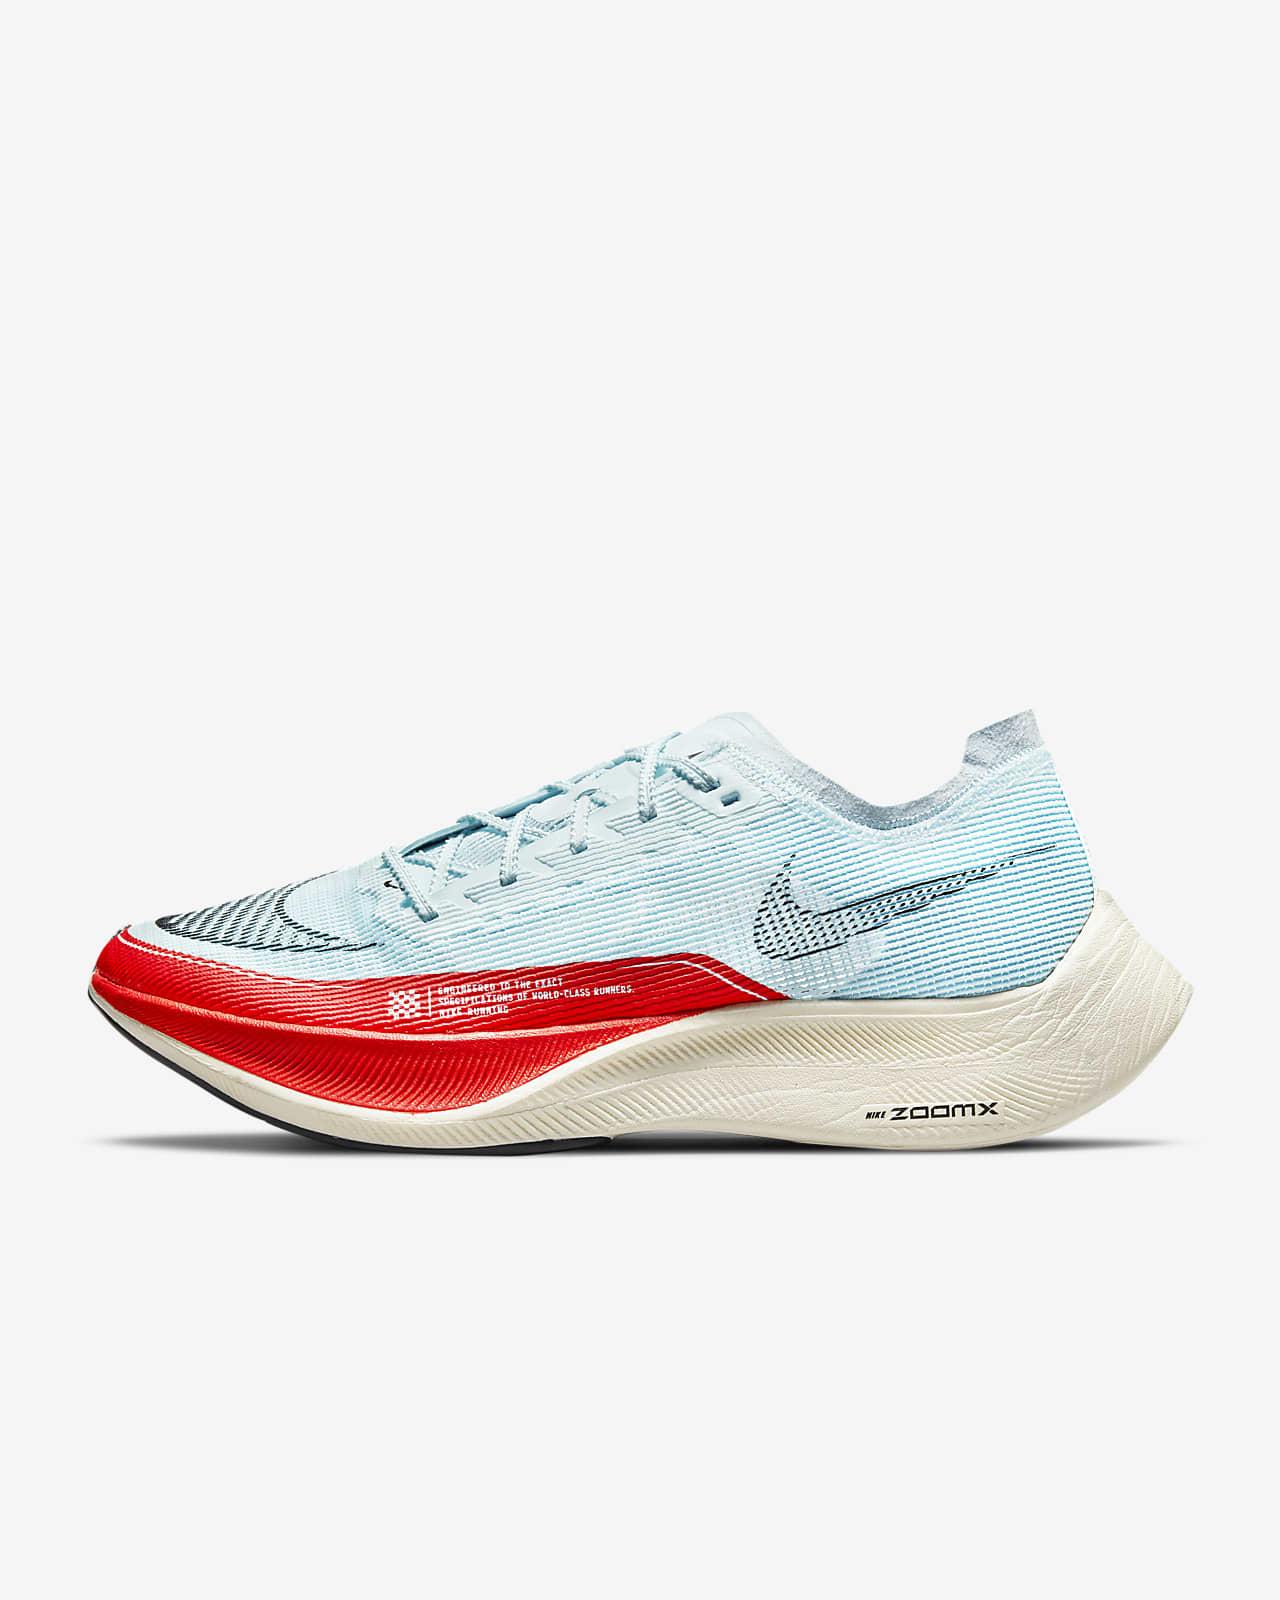 "Nike ZoomX Vaporfly Next% 2 ""OG"" Men's Racing Shoe"